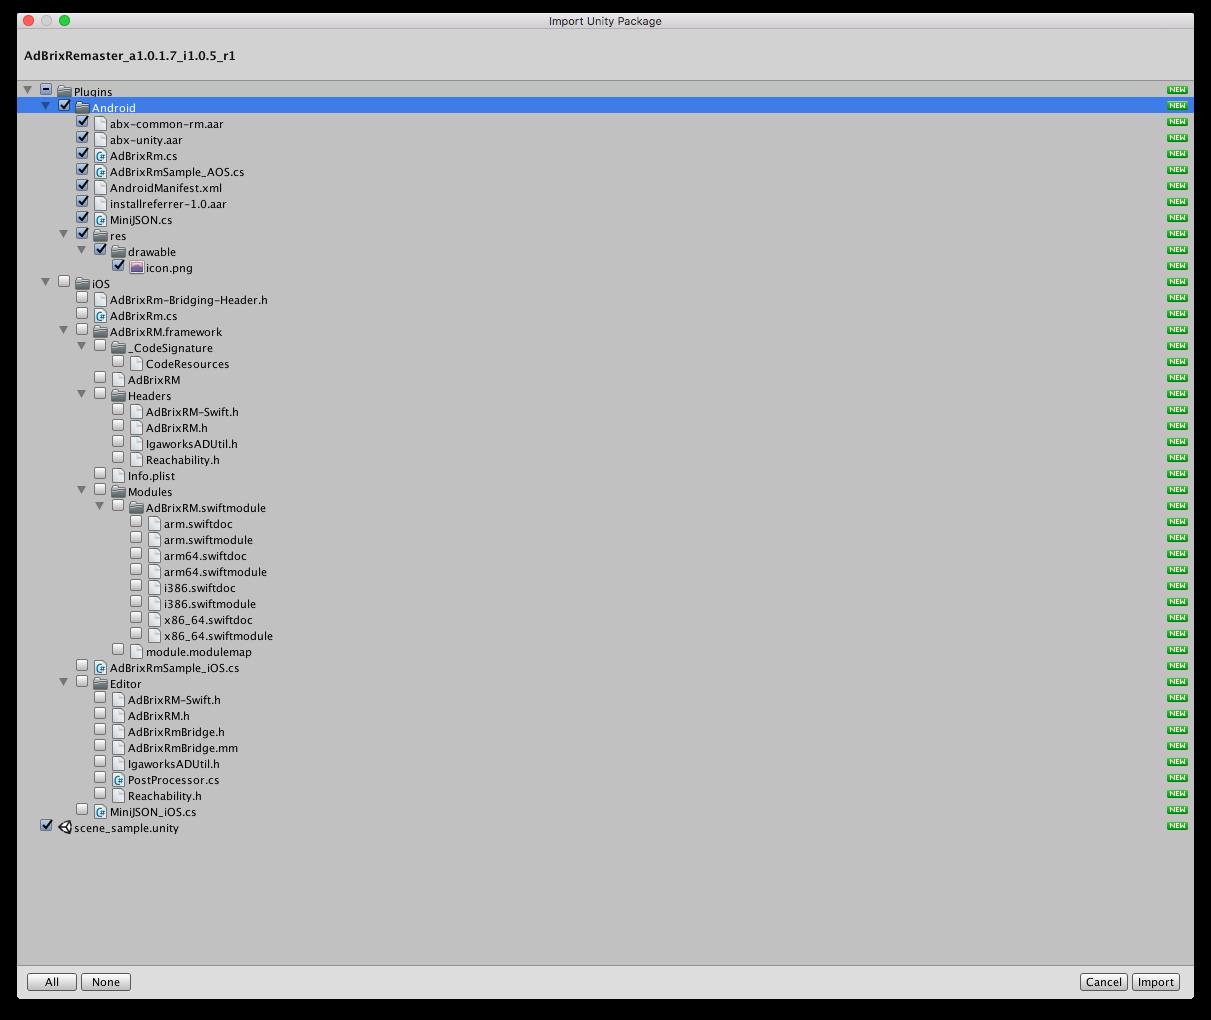 Adbrix Integration [Android Unity] – Adbrix Help Center